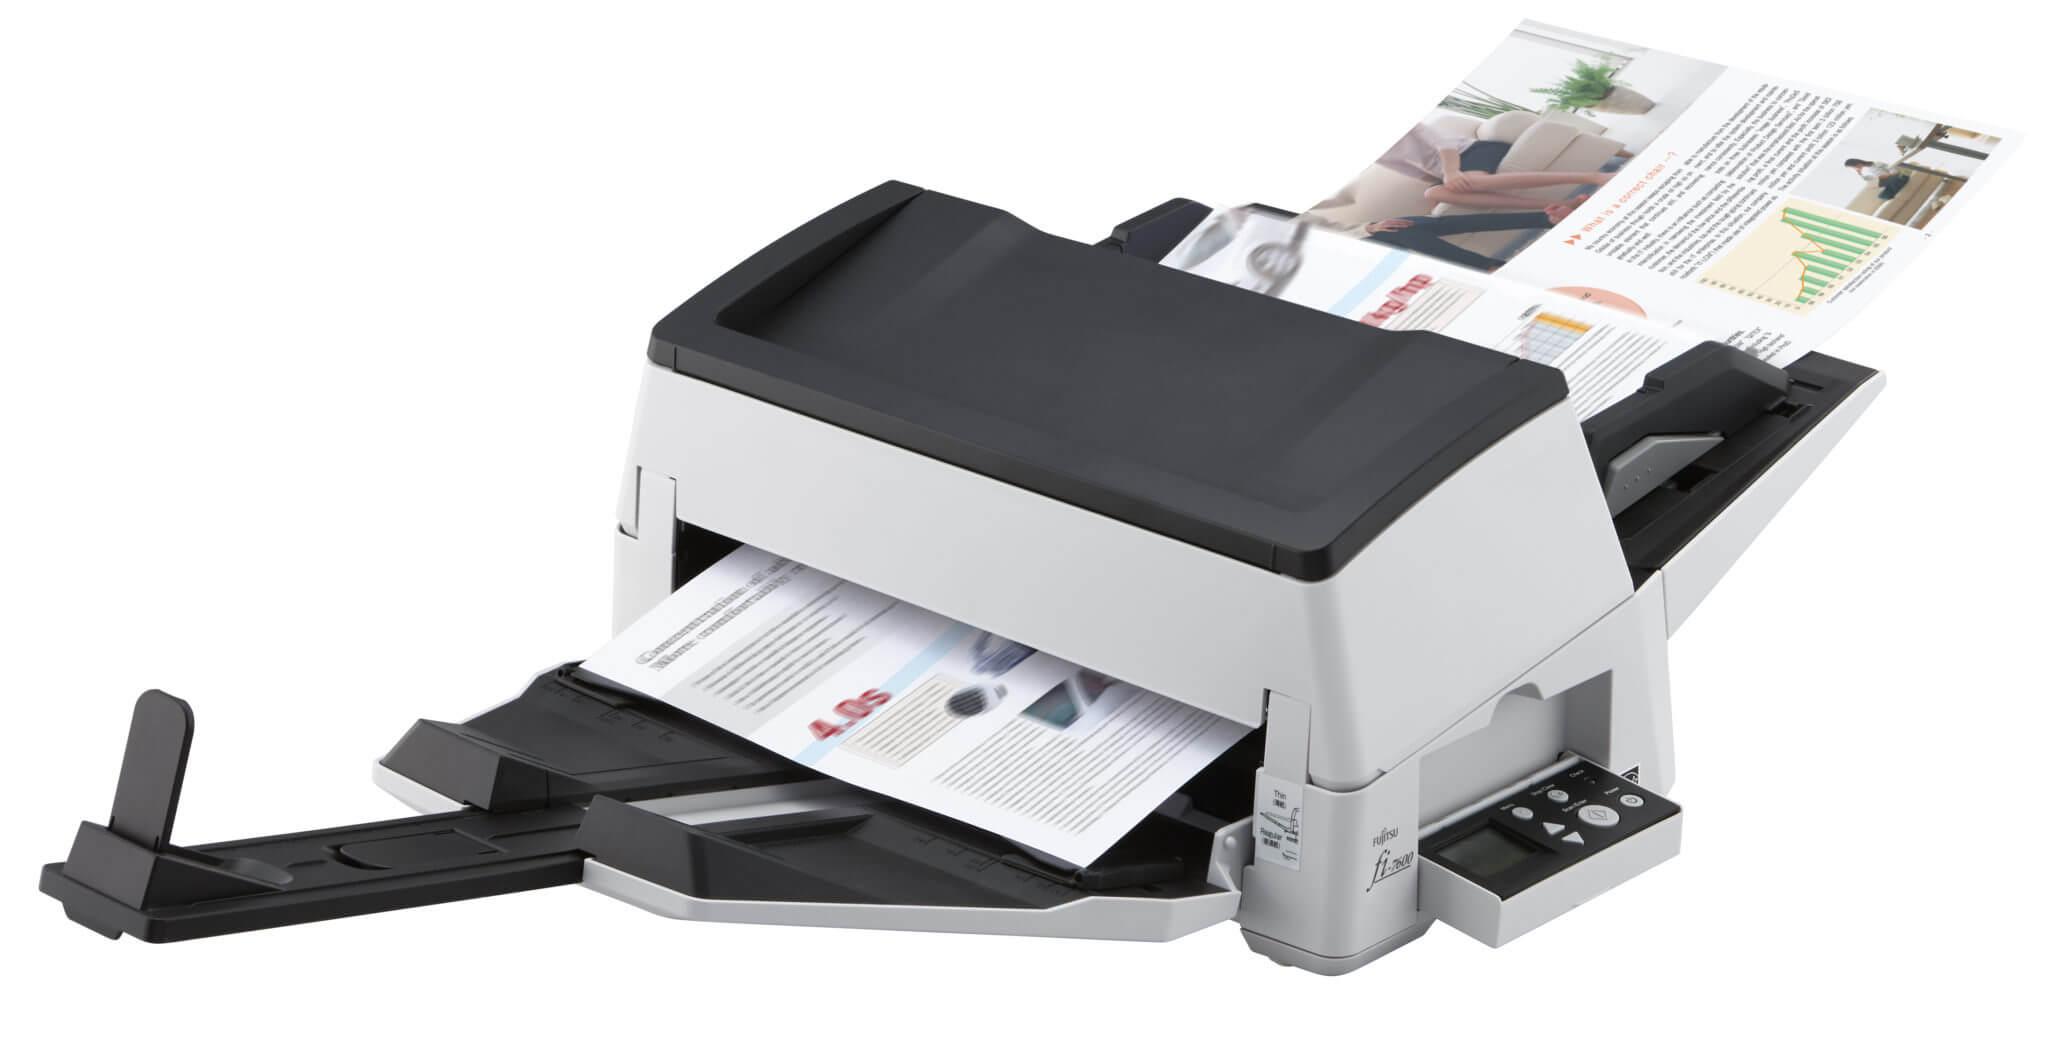 Foto Produto Scanner Fujitsu Fi-7600, 100ppm, Duplex (Frente e Verso)